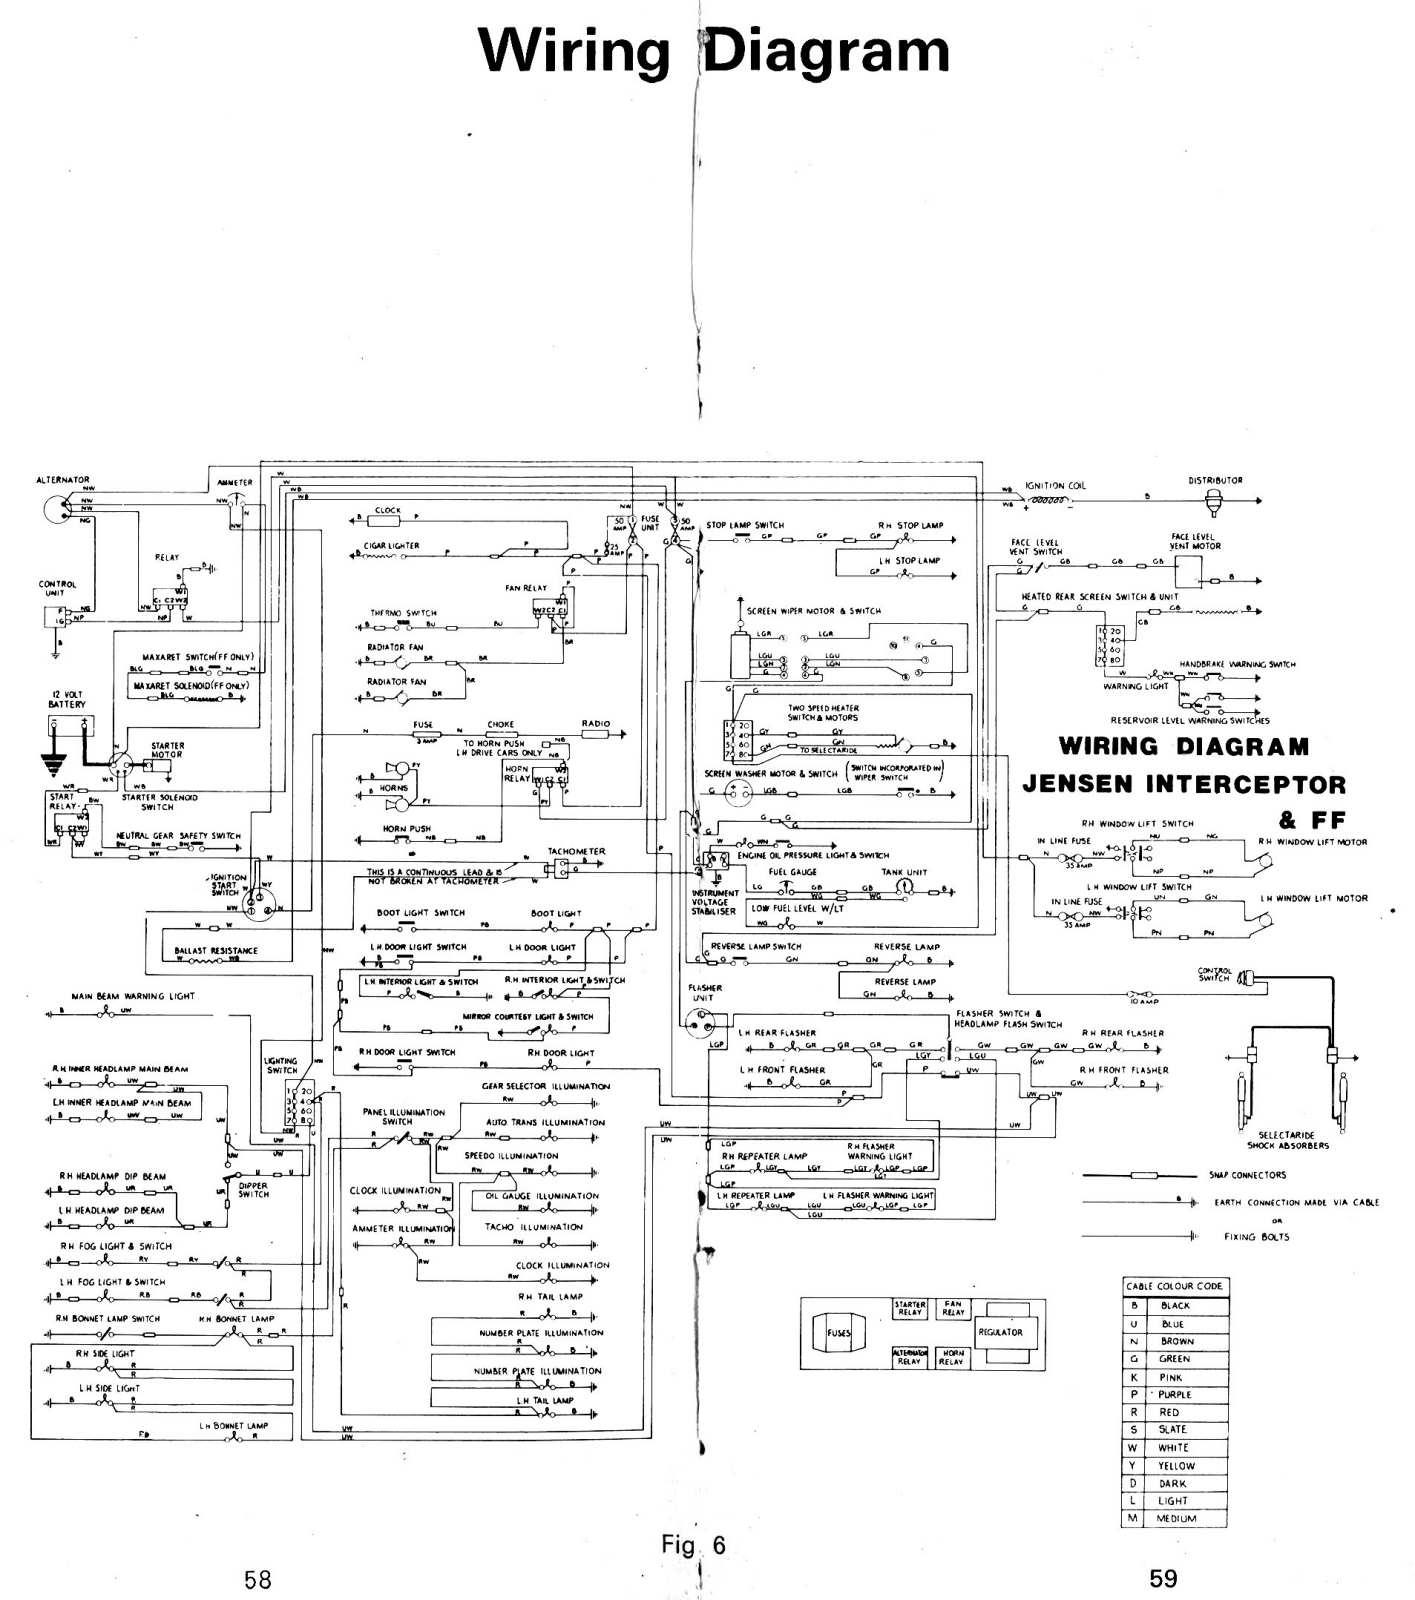 Diagram Saab 9000 Stereo Wiring Diagram Full Version Hd Quality Wiring Diagram Cablingwiring2h Hotelboitedolomiti It